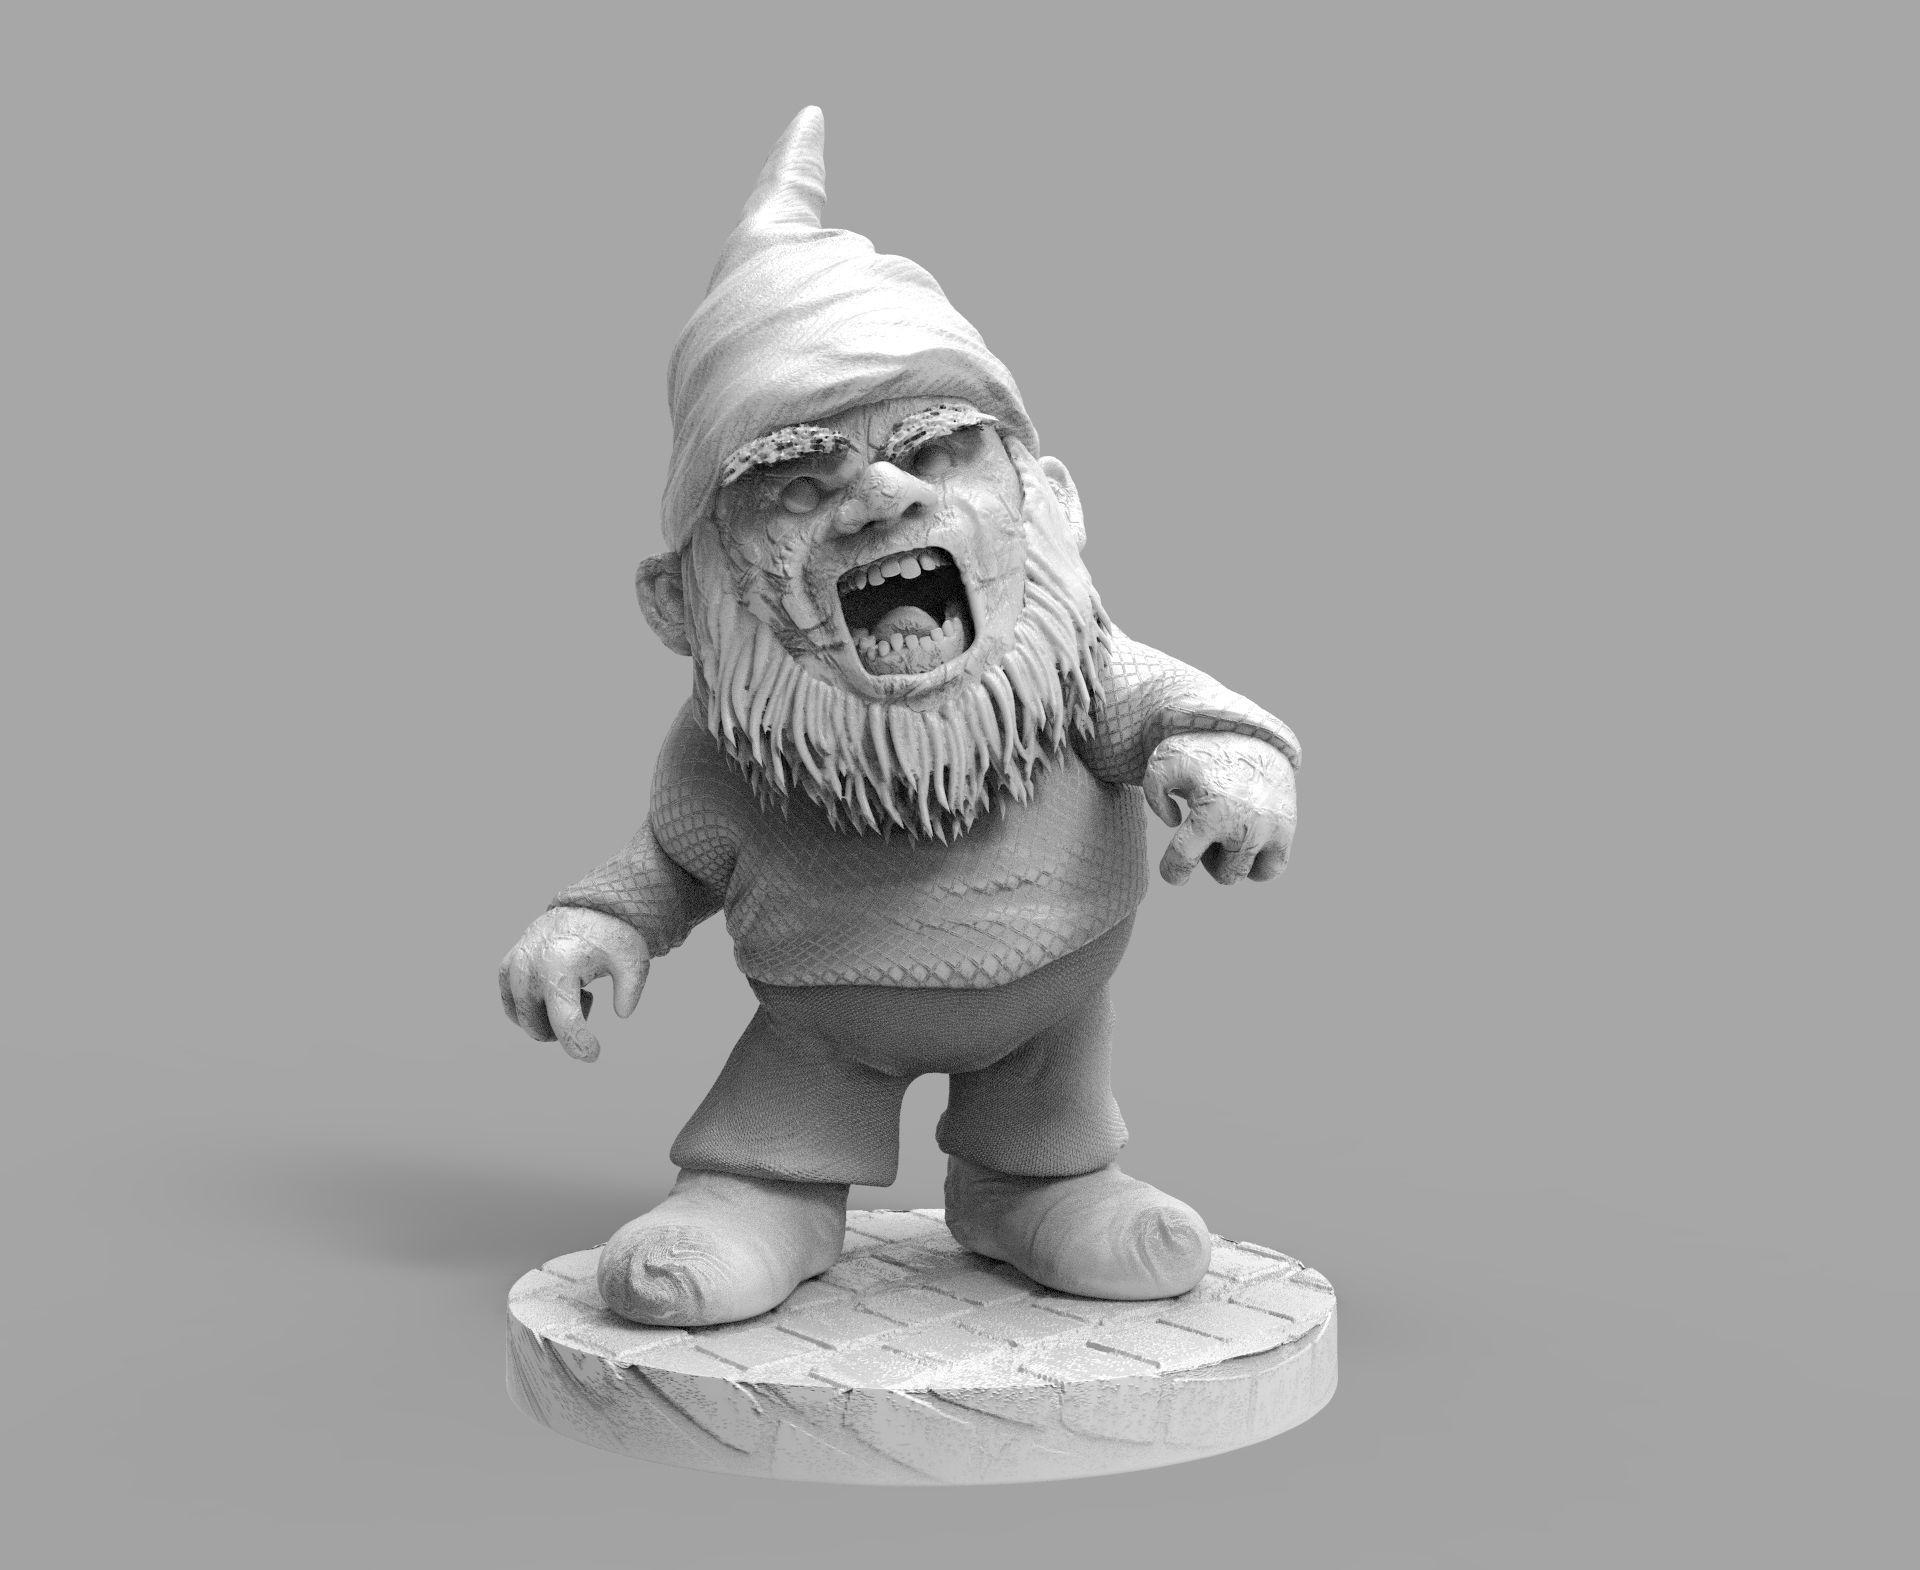 Zombie Evil Garden Gnome 3D Print Model Diorama